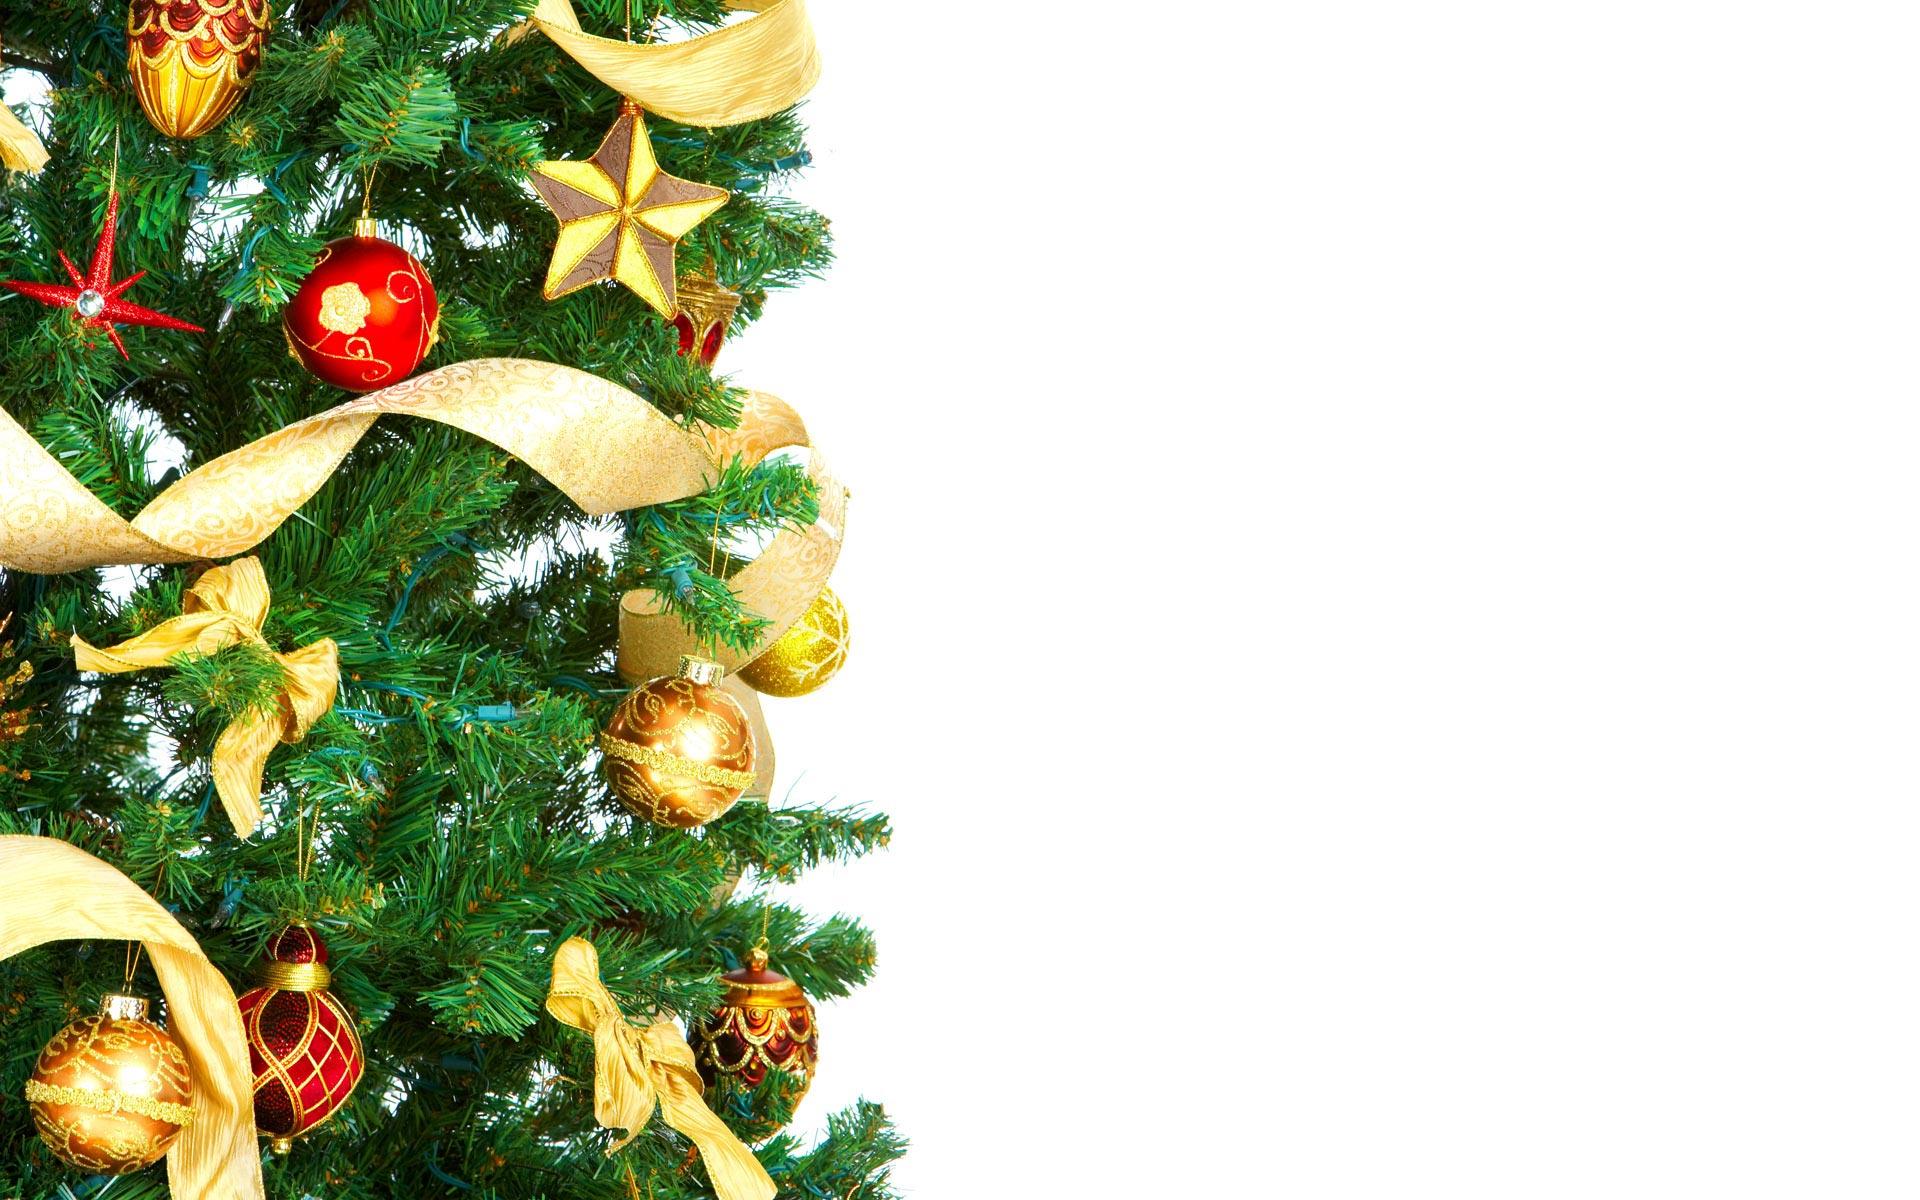 Sfondi Natalizi Originali.Sfondo Desktop Albero Di Natale Sfondo Natalizio Albero Di Natale